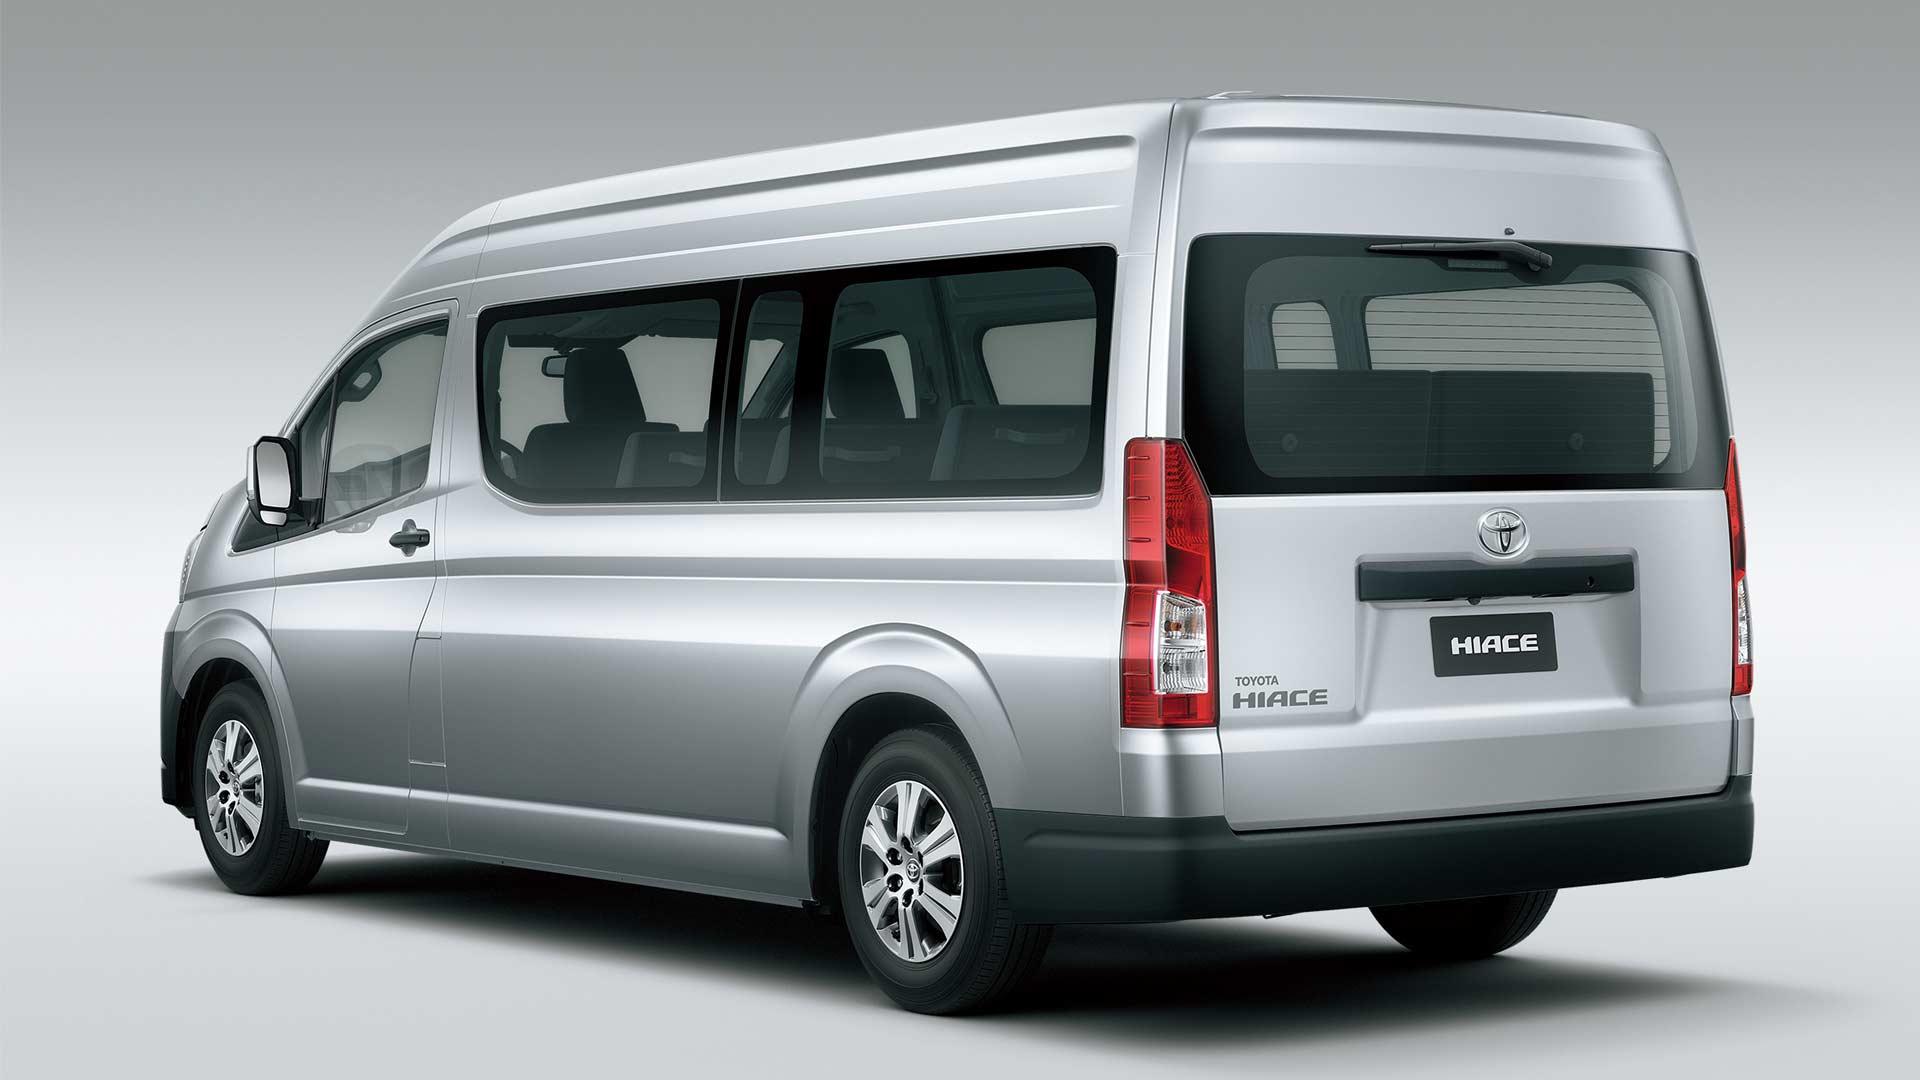 2019-6th-generation-Toyota-Hiace_4